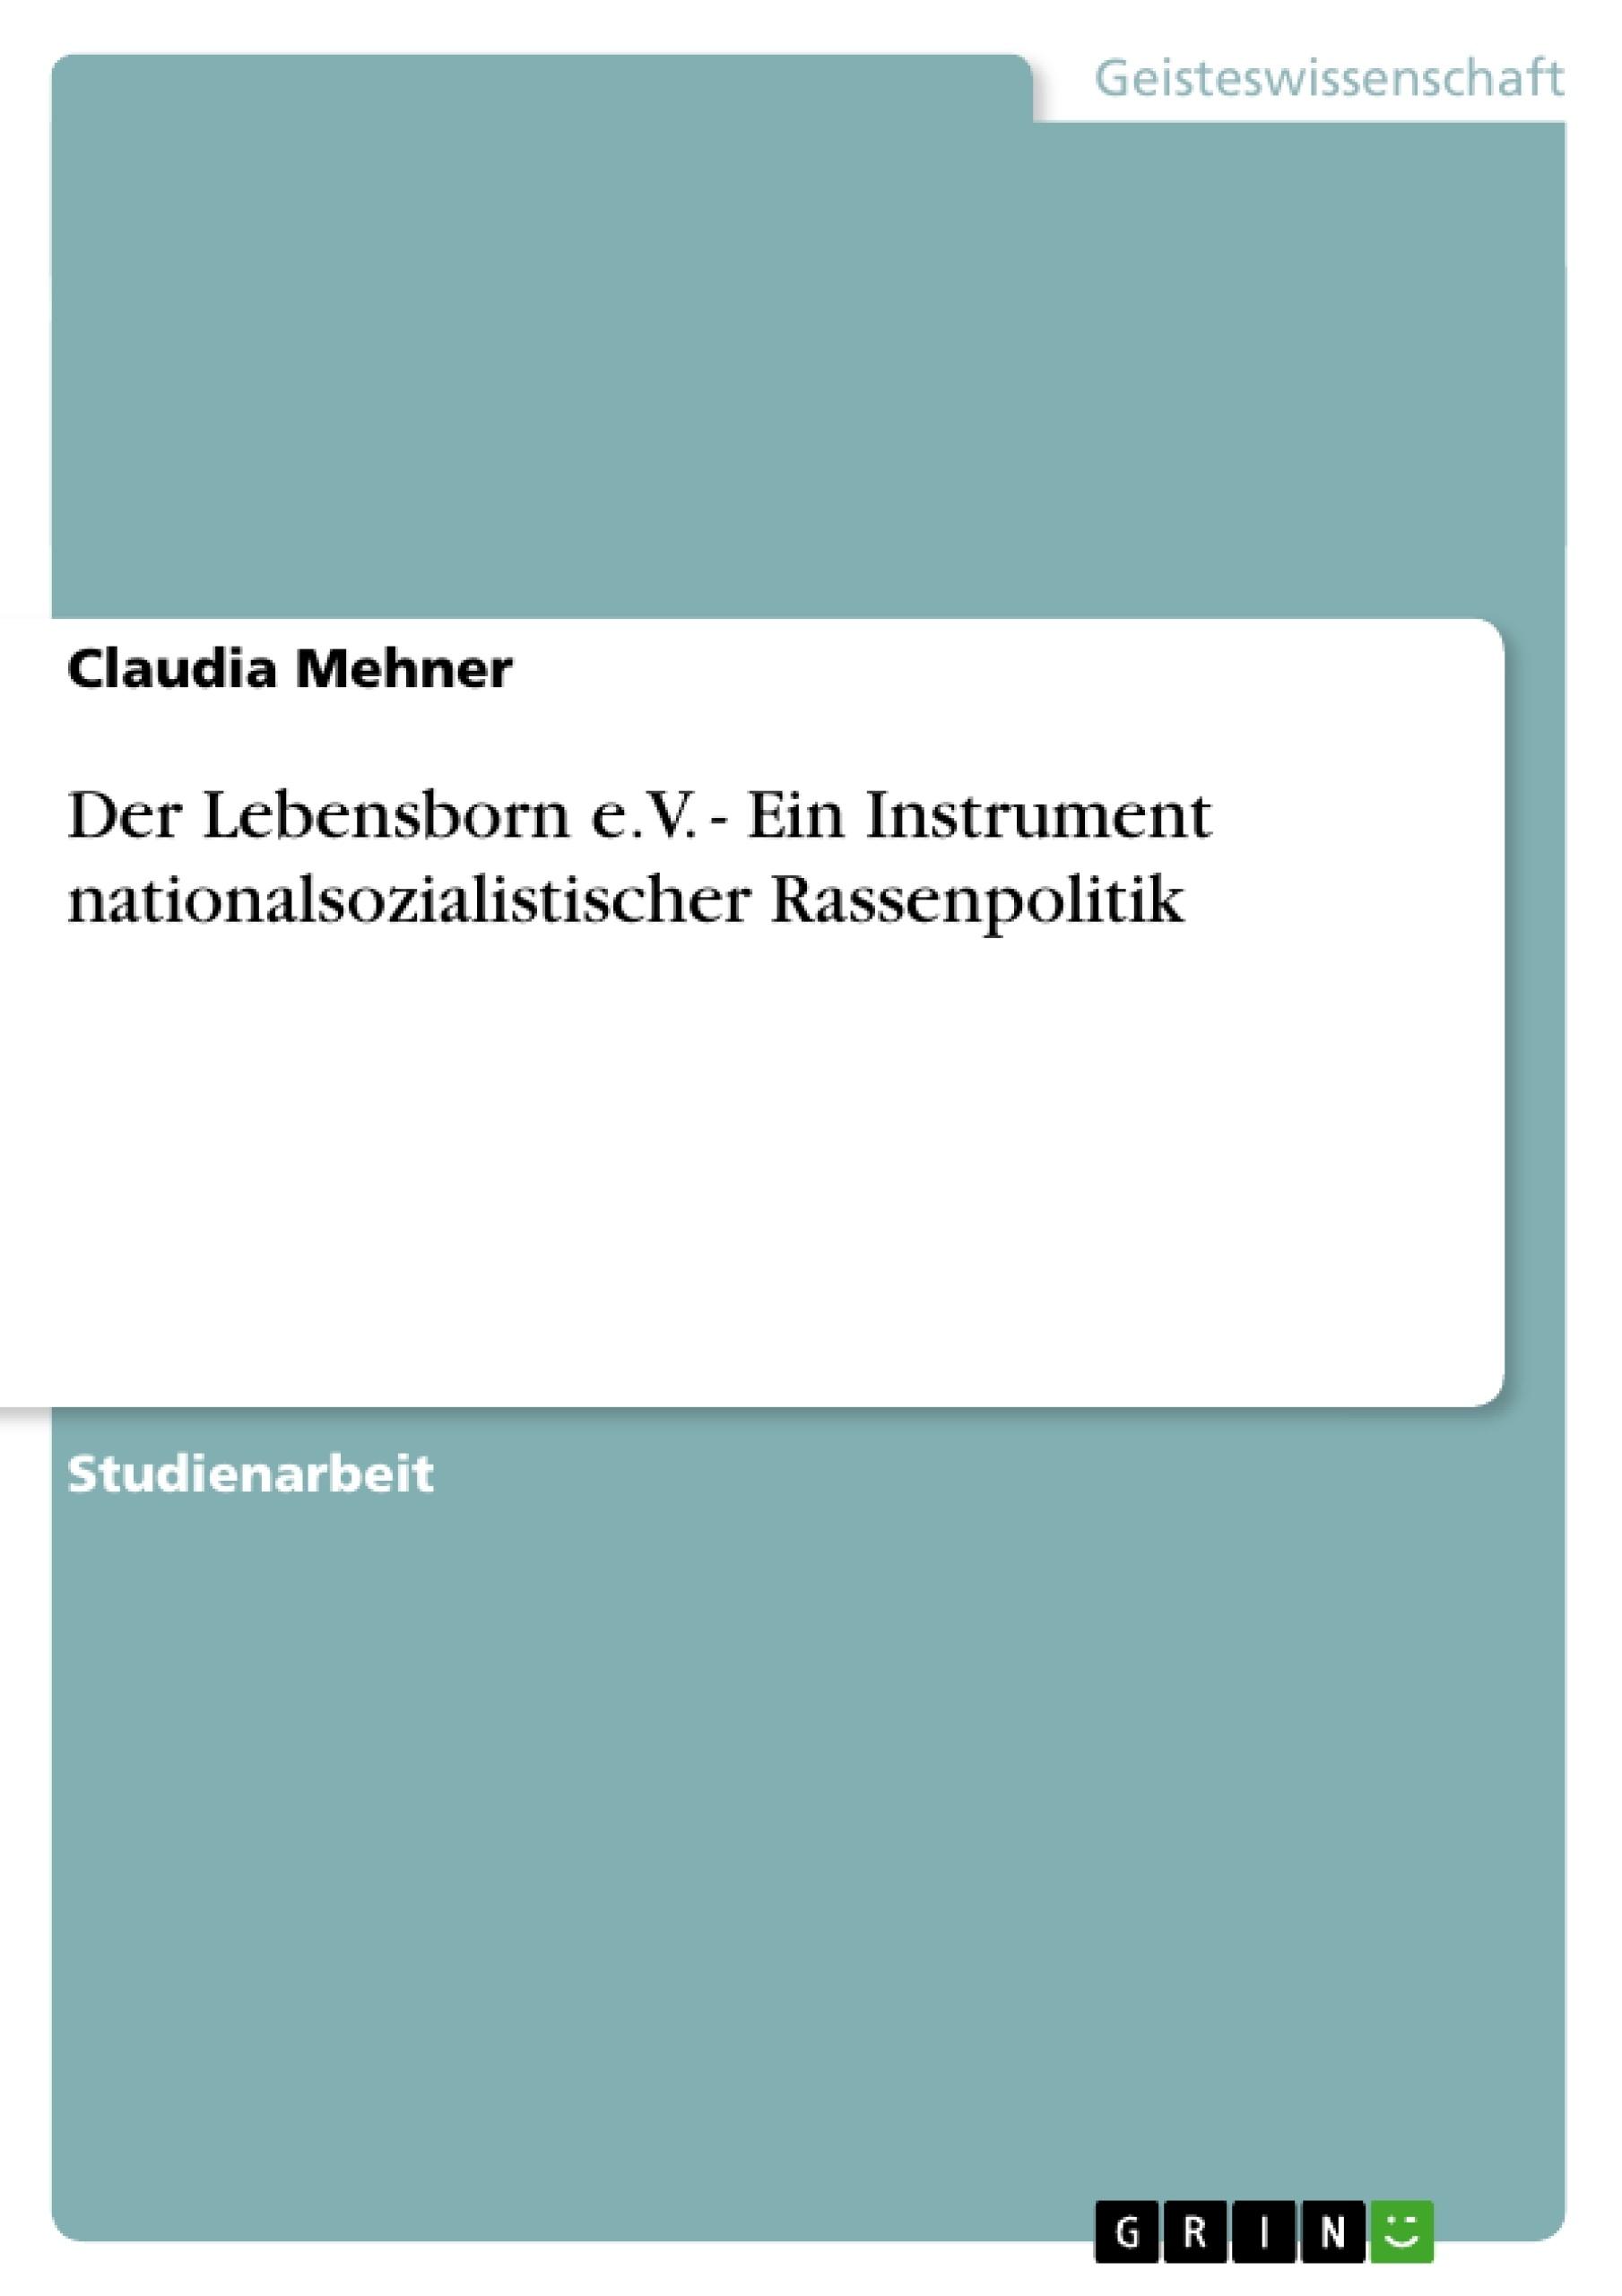 Titel: Der Lebensborn e.V. - Ein Instrument nationalsozialistischer Rassenpolitik